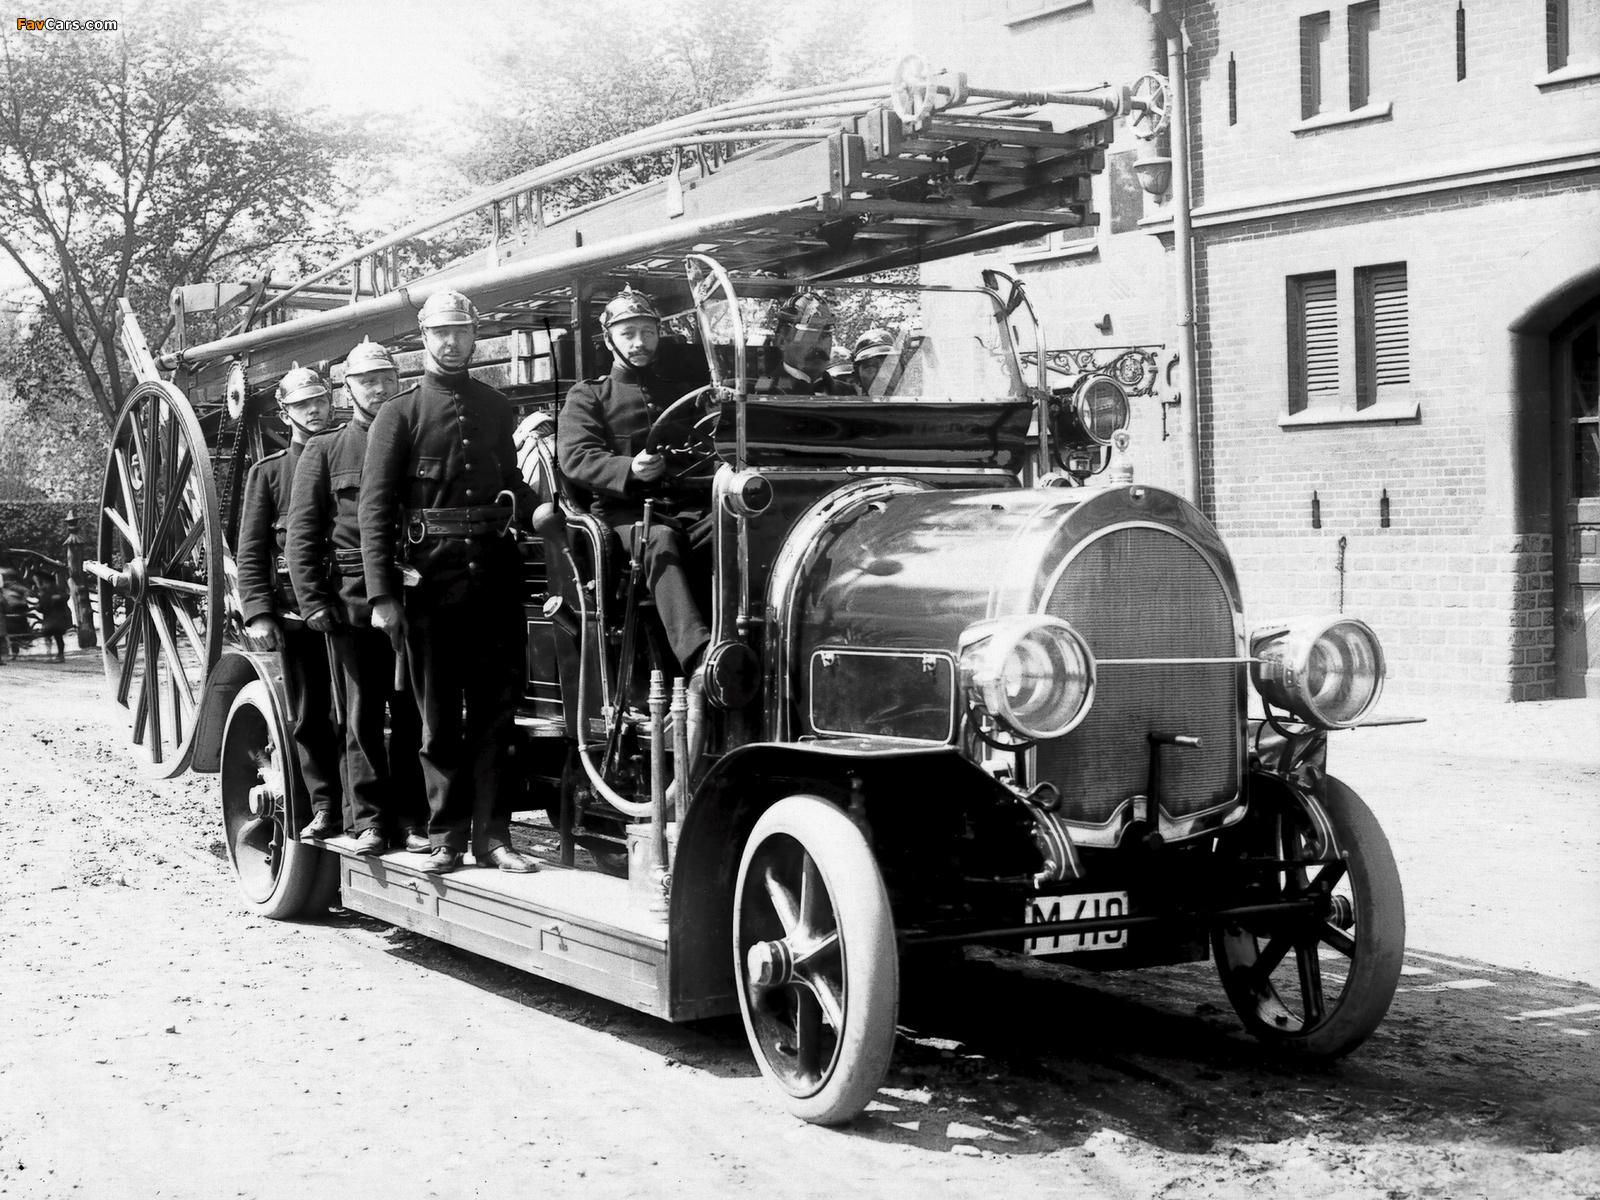 Photos of Scania-Vabis Firetruck 1911 (1600 x 1200)